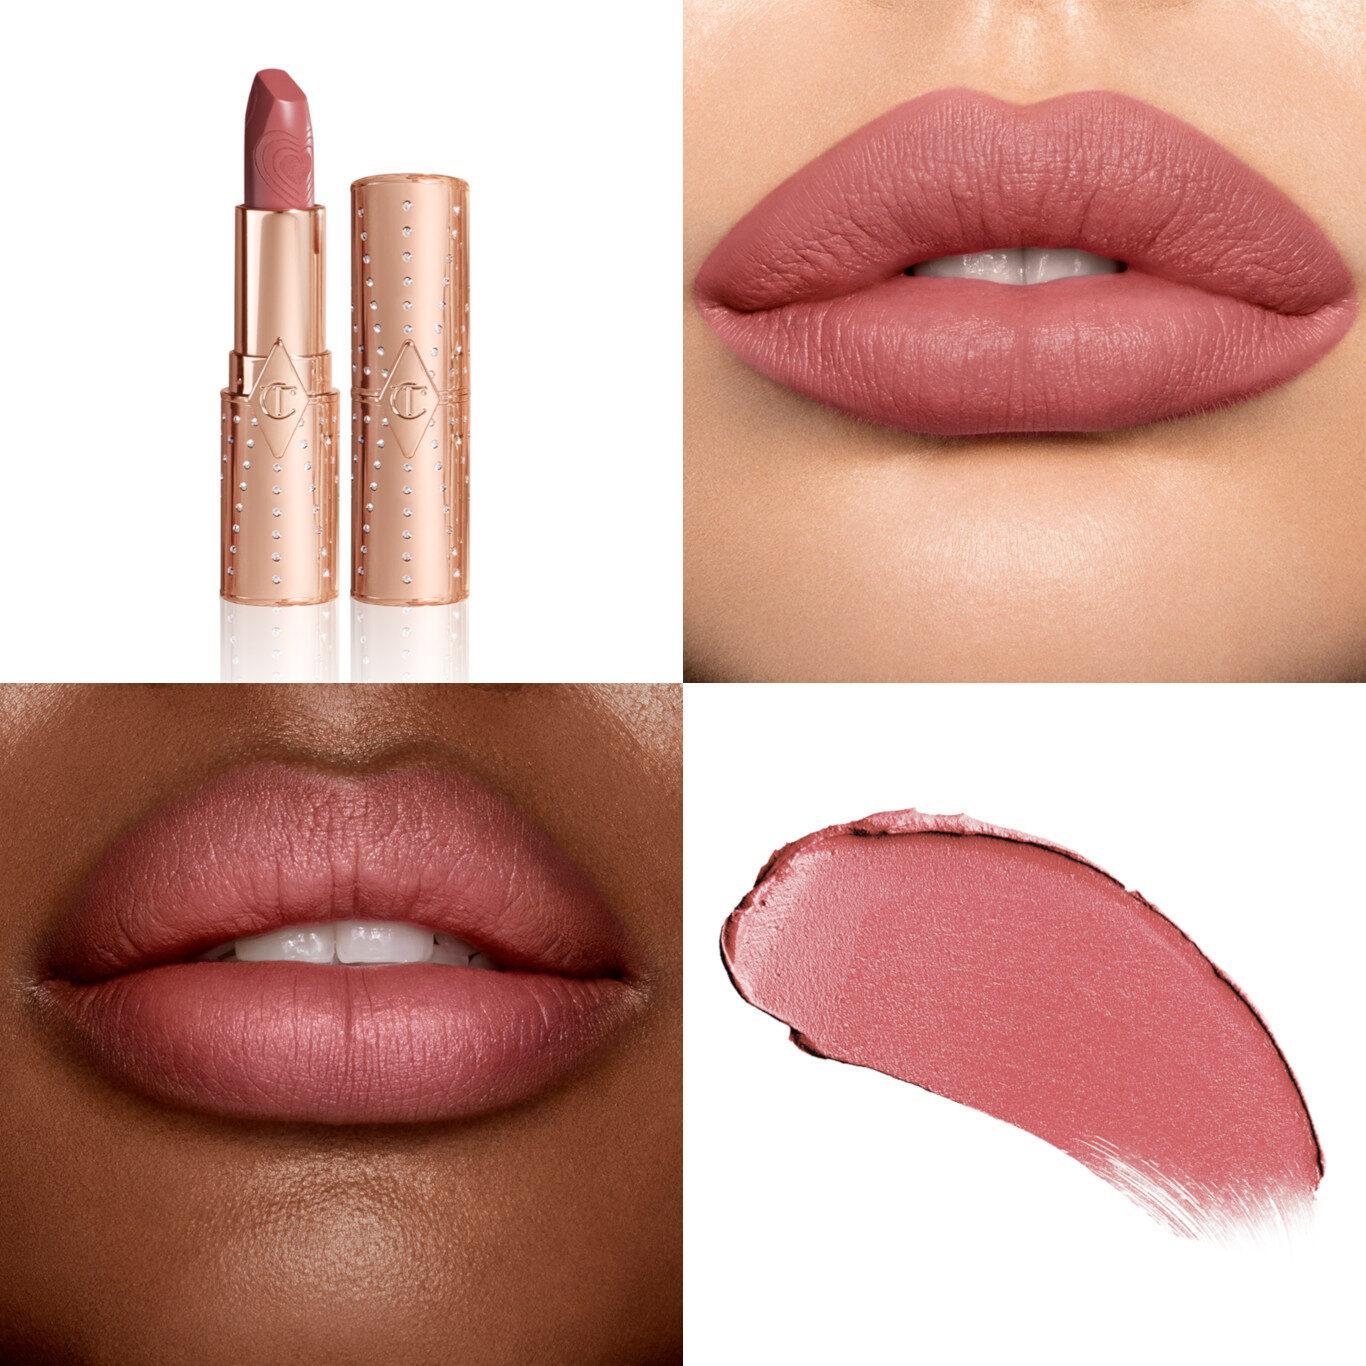 Charlotte Tilbury Look Of Love Lipstick in Wedding Belles